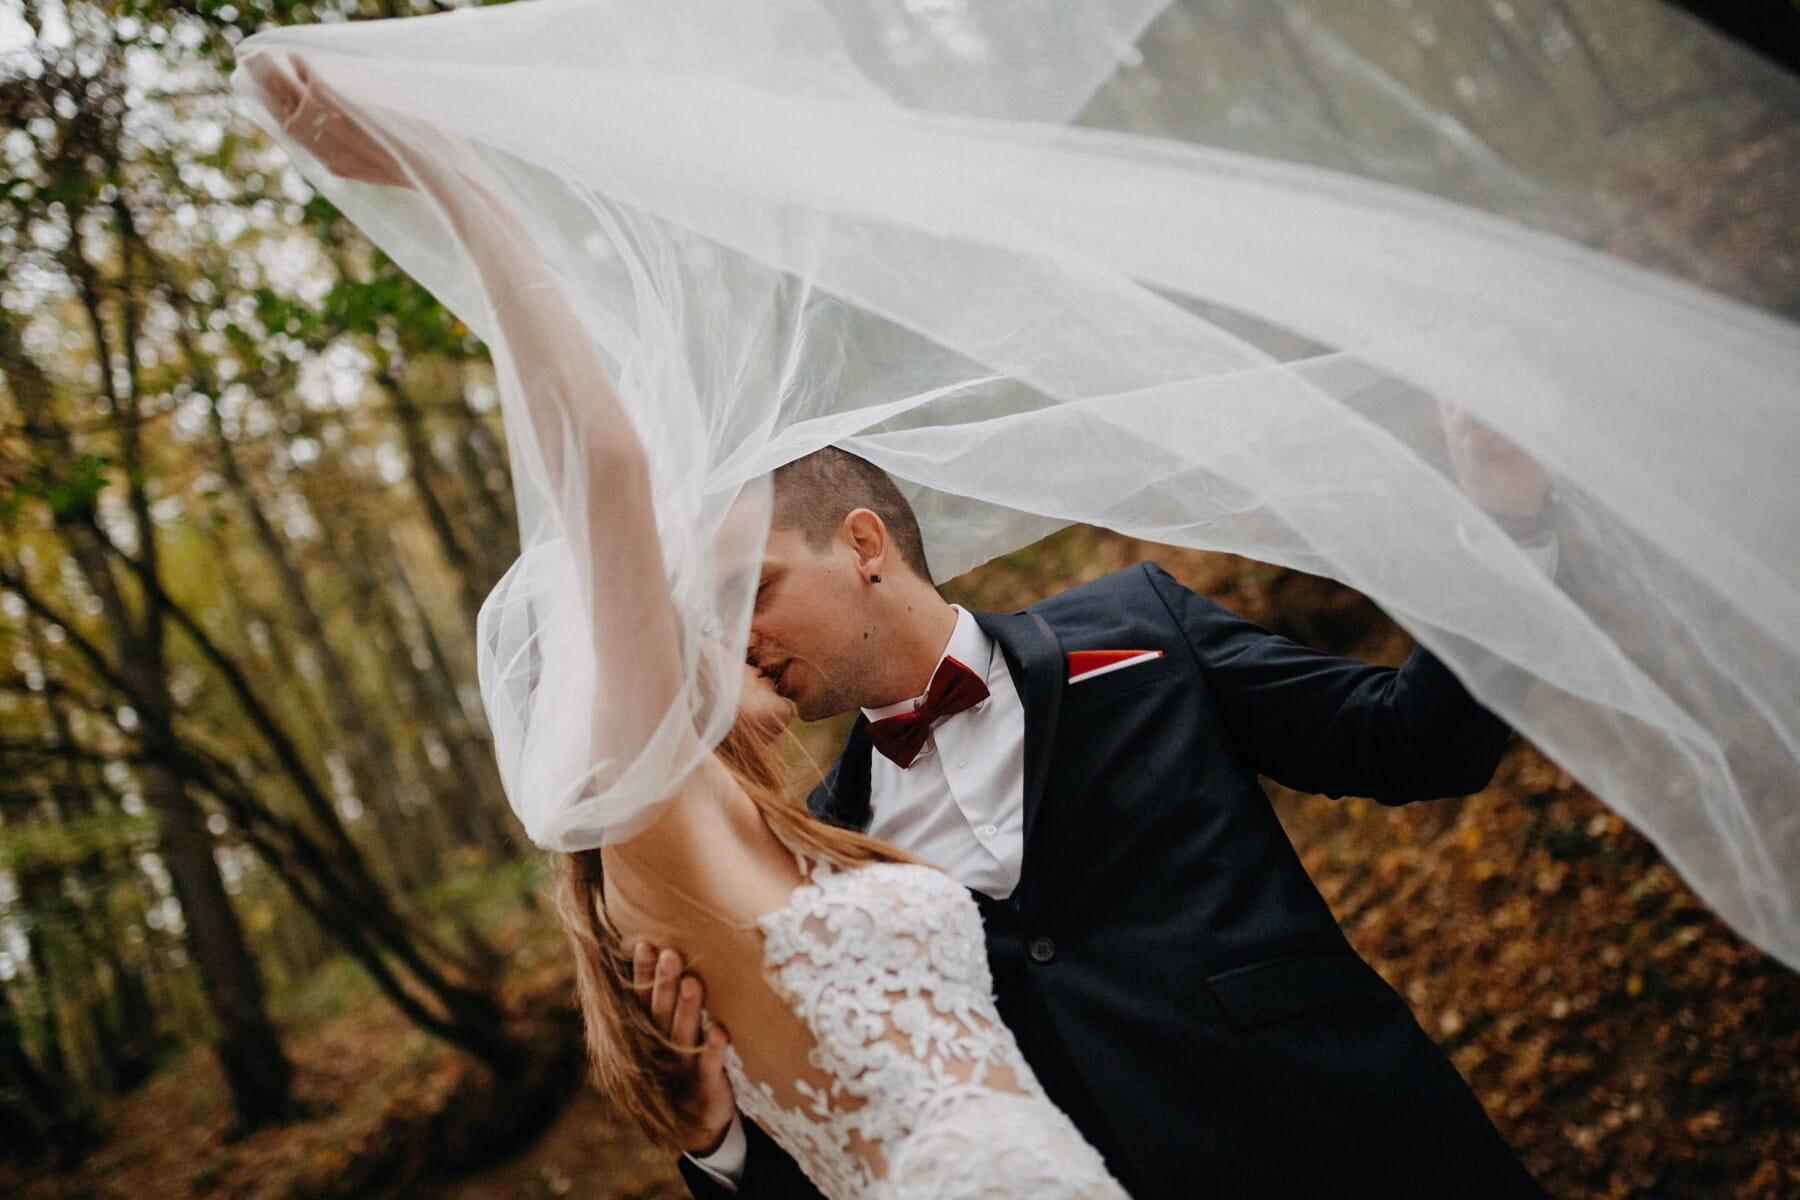 lady, gentleman, underneath, kiss, wedding dress, love, bride, groom, wedding, woman